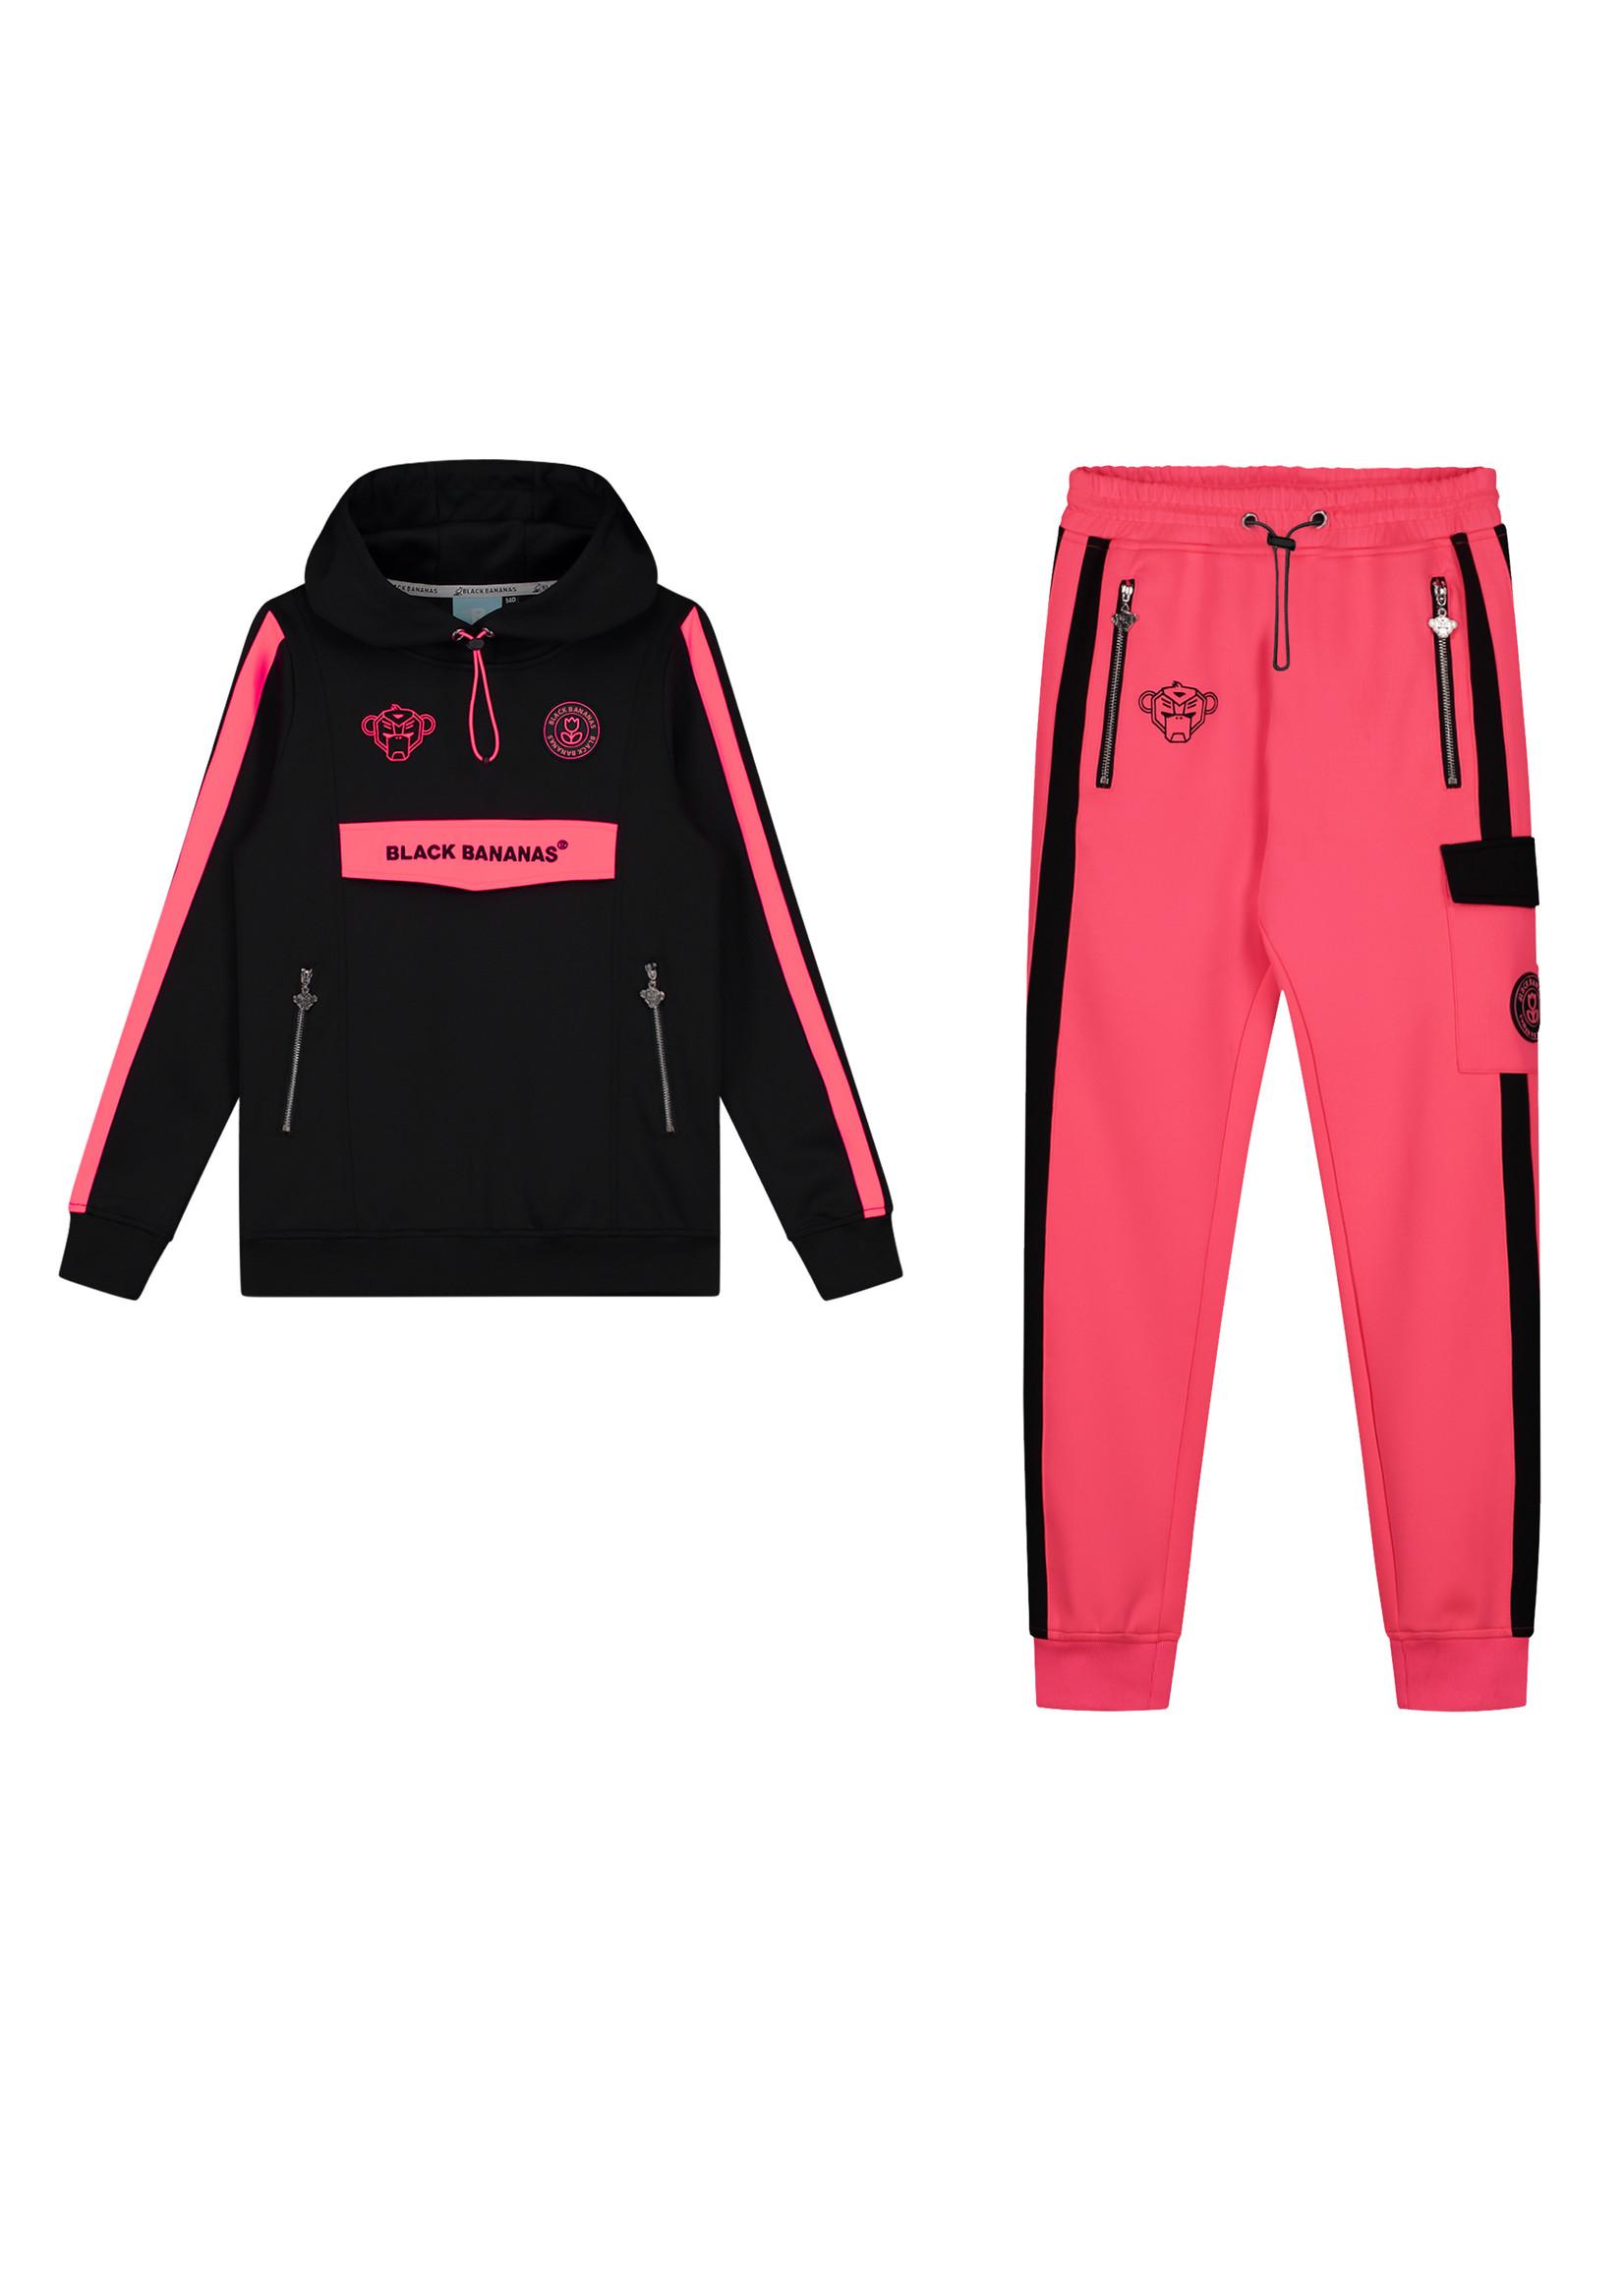 Black Bananas BlackBananas Jr. Anorak Match Trackpants pink